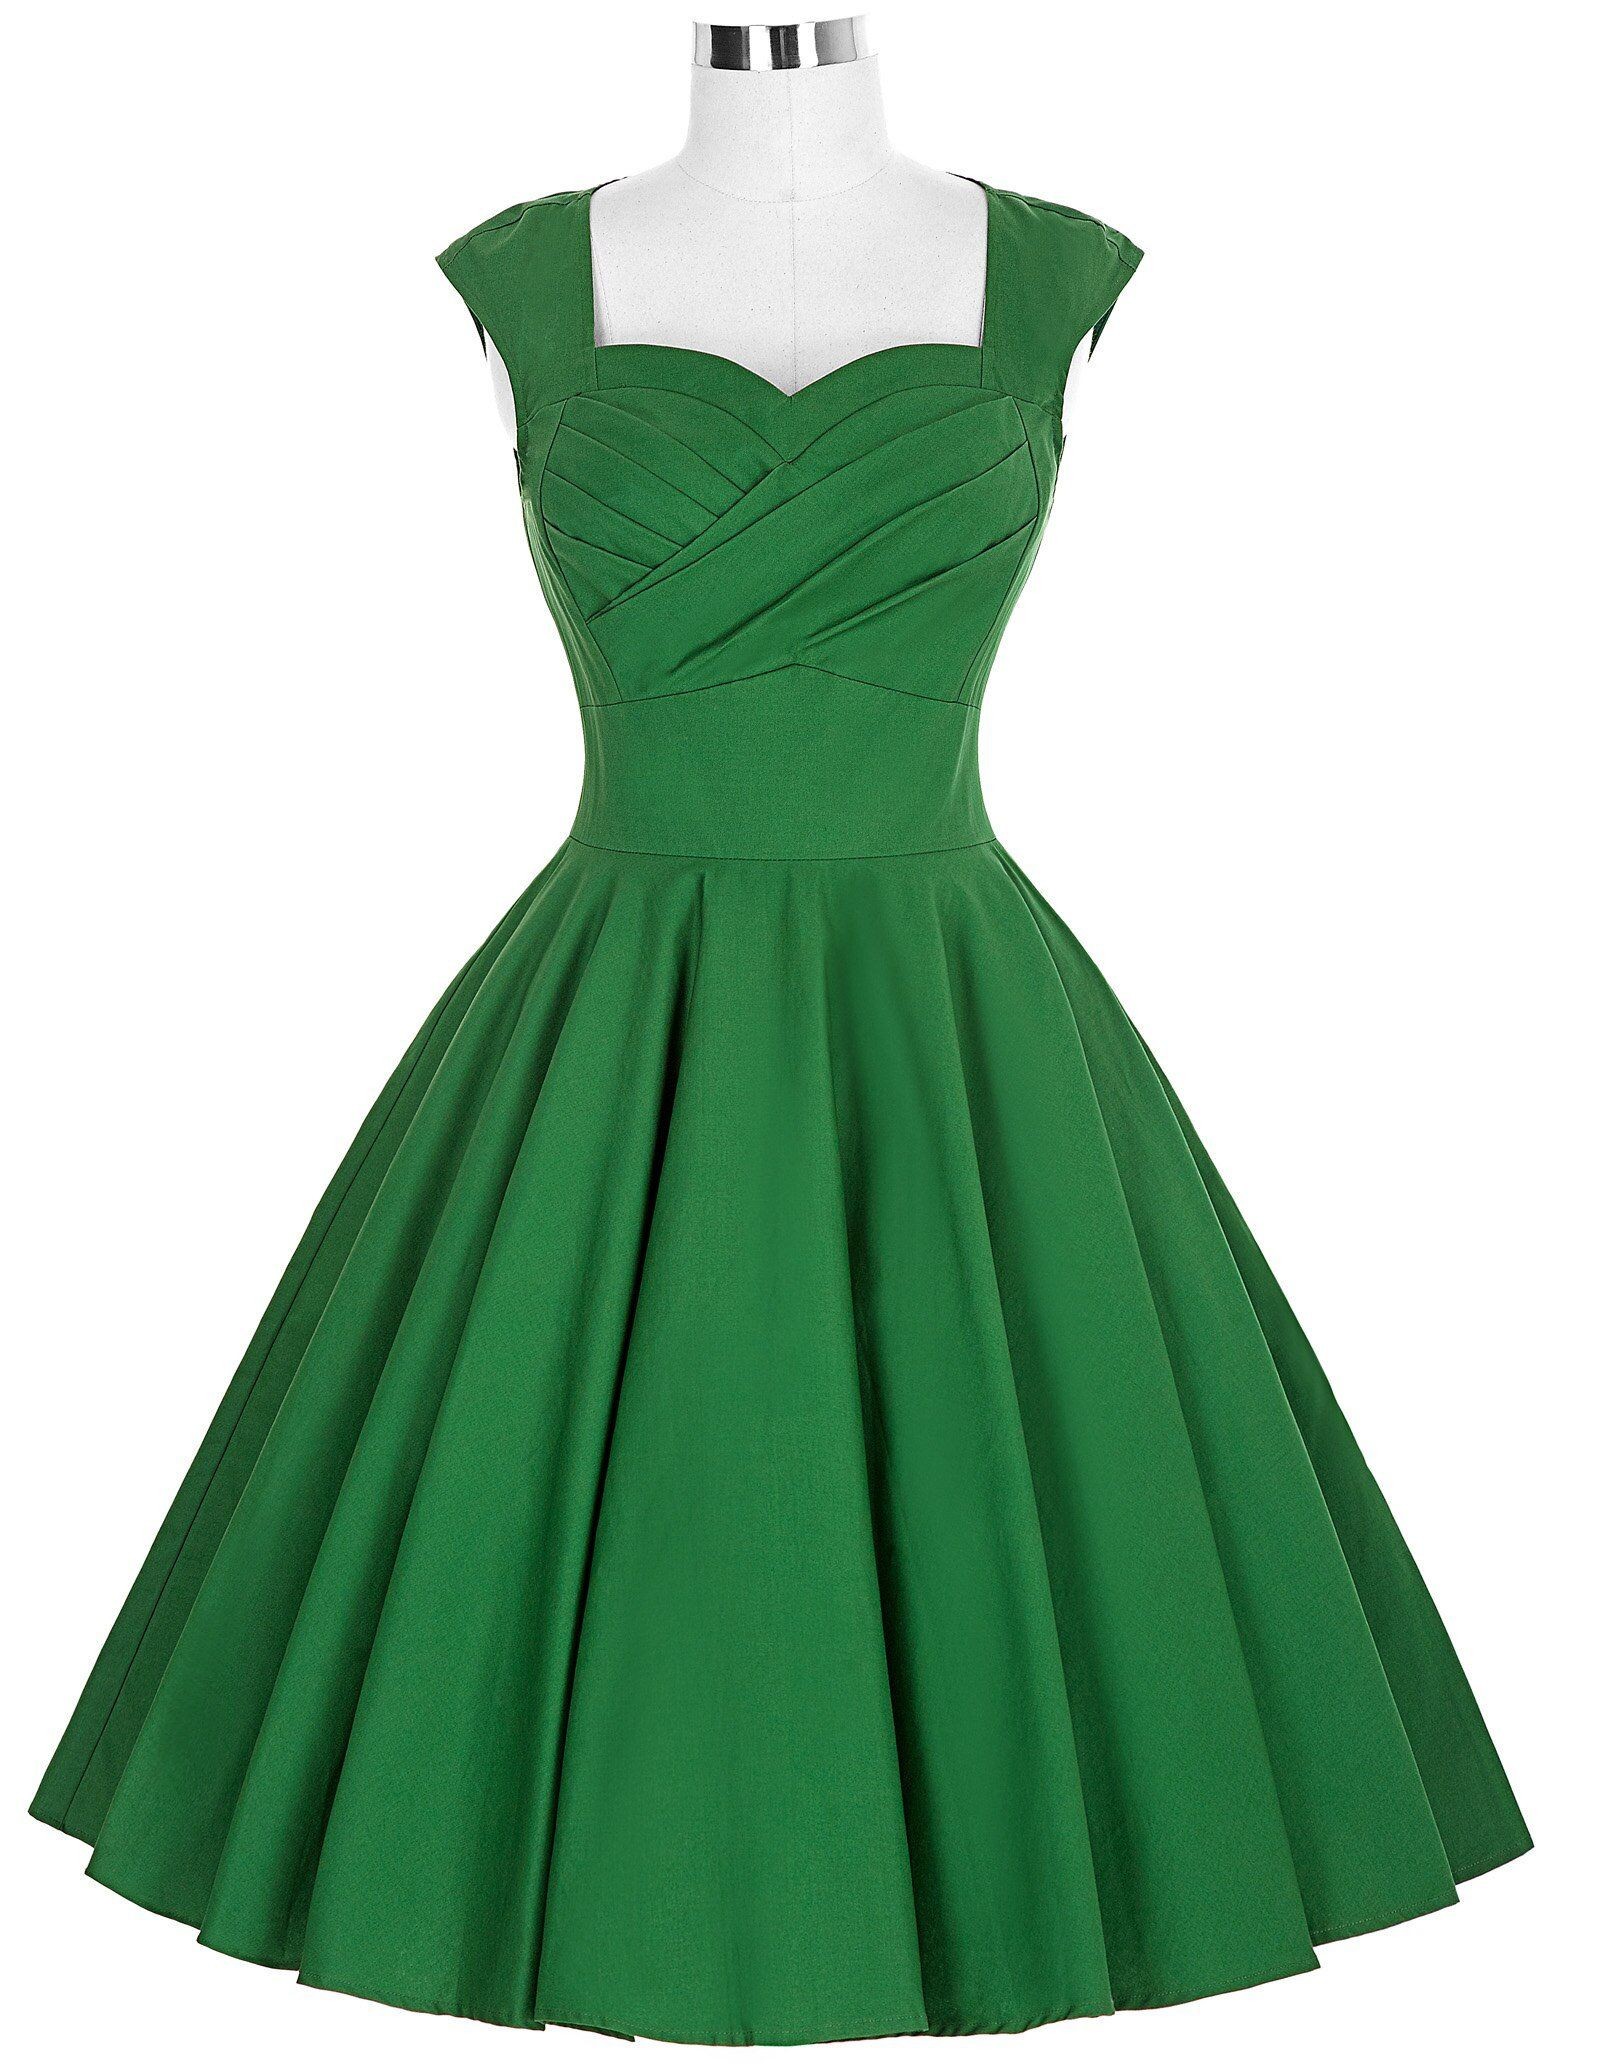 Women S Retro 1950s 60s Evening Party Casual Vintage Flared Wiggle Swing Dresses Solid Color Ruched Dress Women Vestido Boho Dresses Long White Maxi Dress Boho Vintage Dress 60s [ 2072 x 1600 Pixel ]